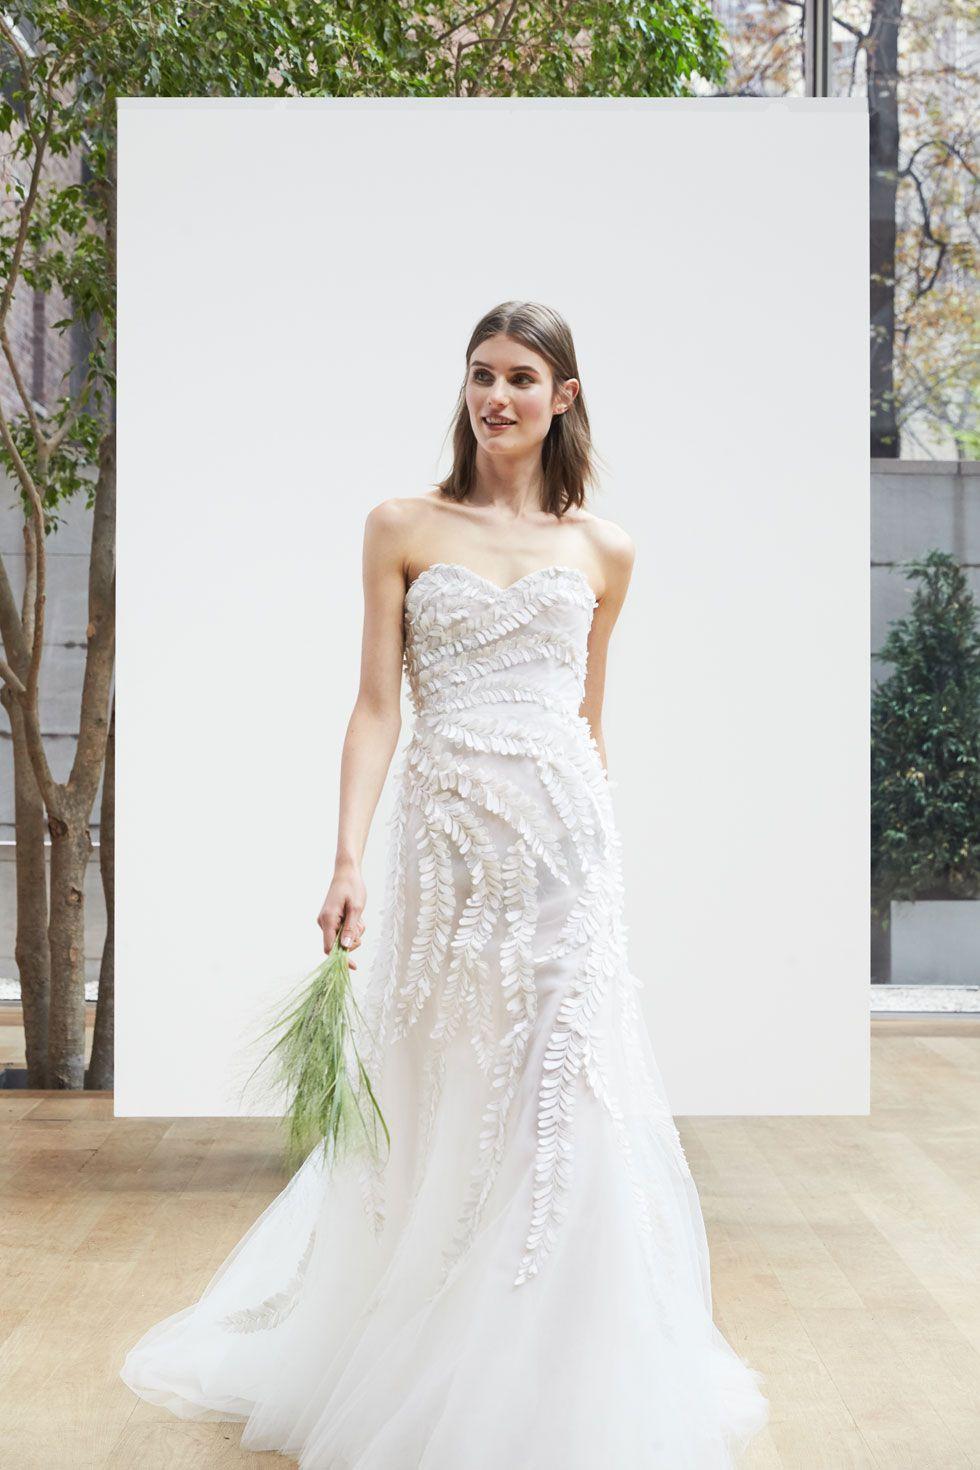 Beachy Wedding Dresses 99 beautiful beach wedding dresses - bridal gowns for a beach destination  wedding QKUTFRK